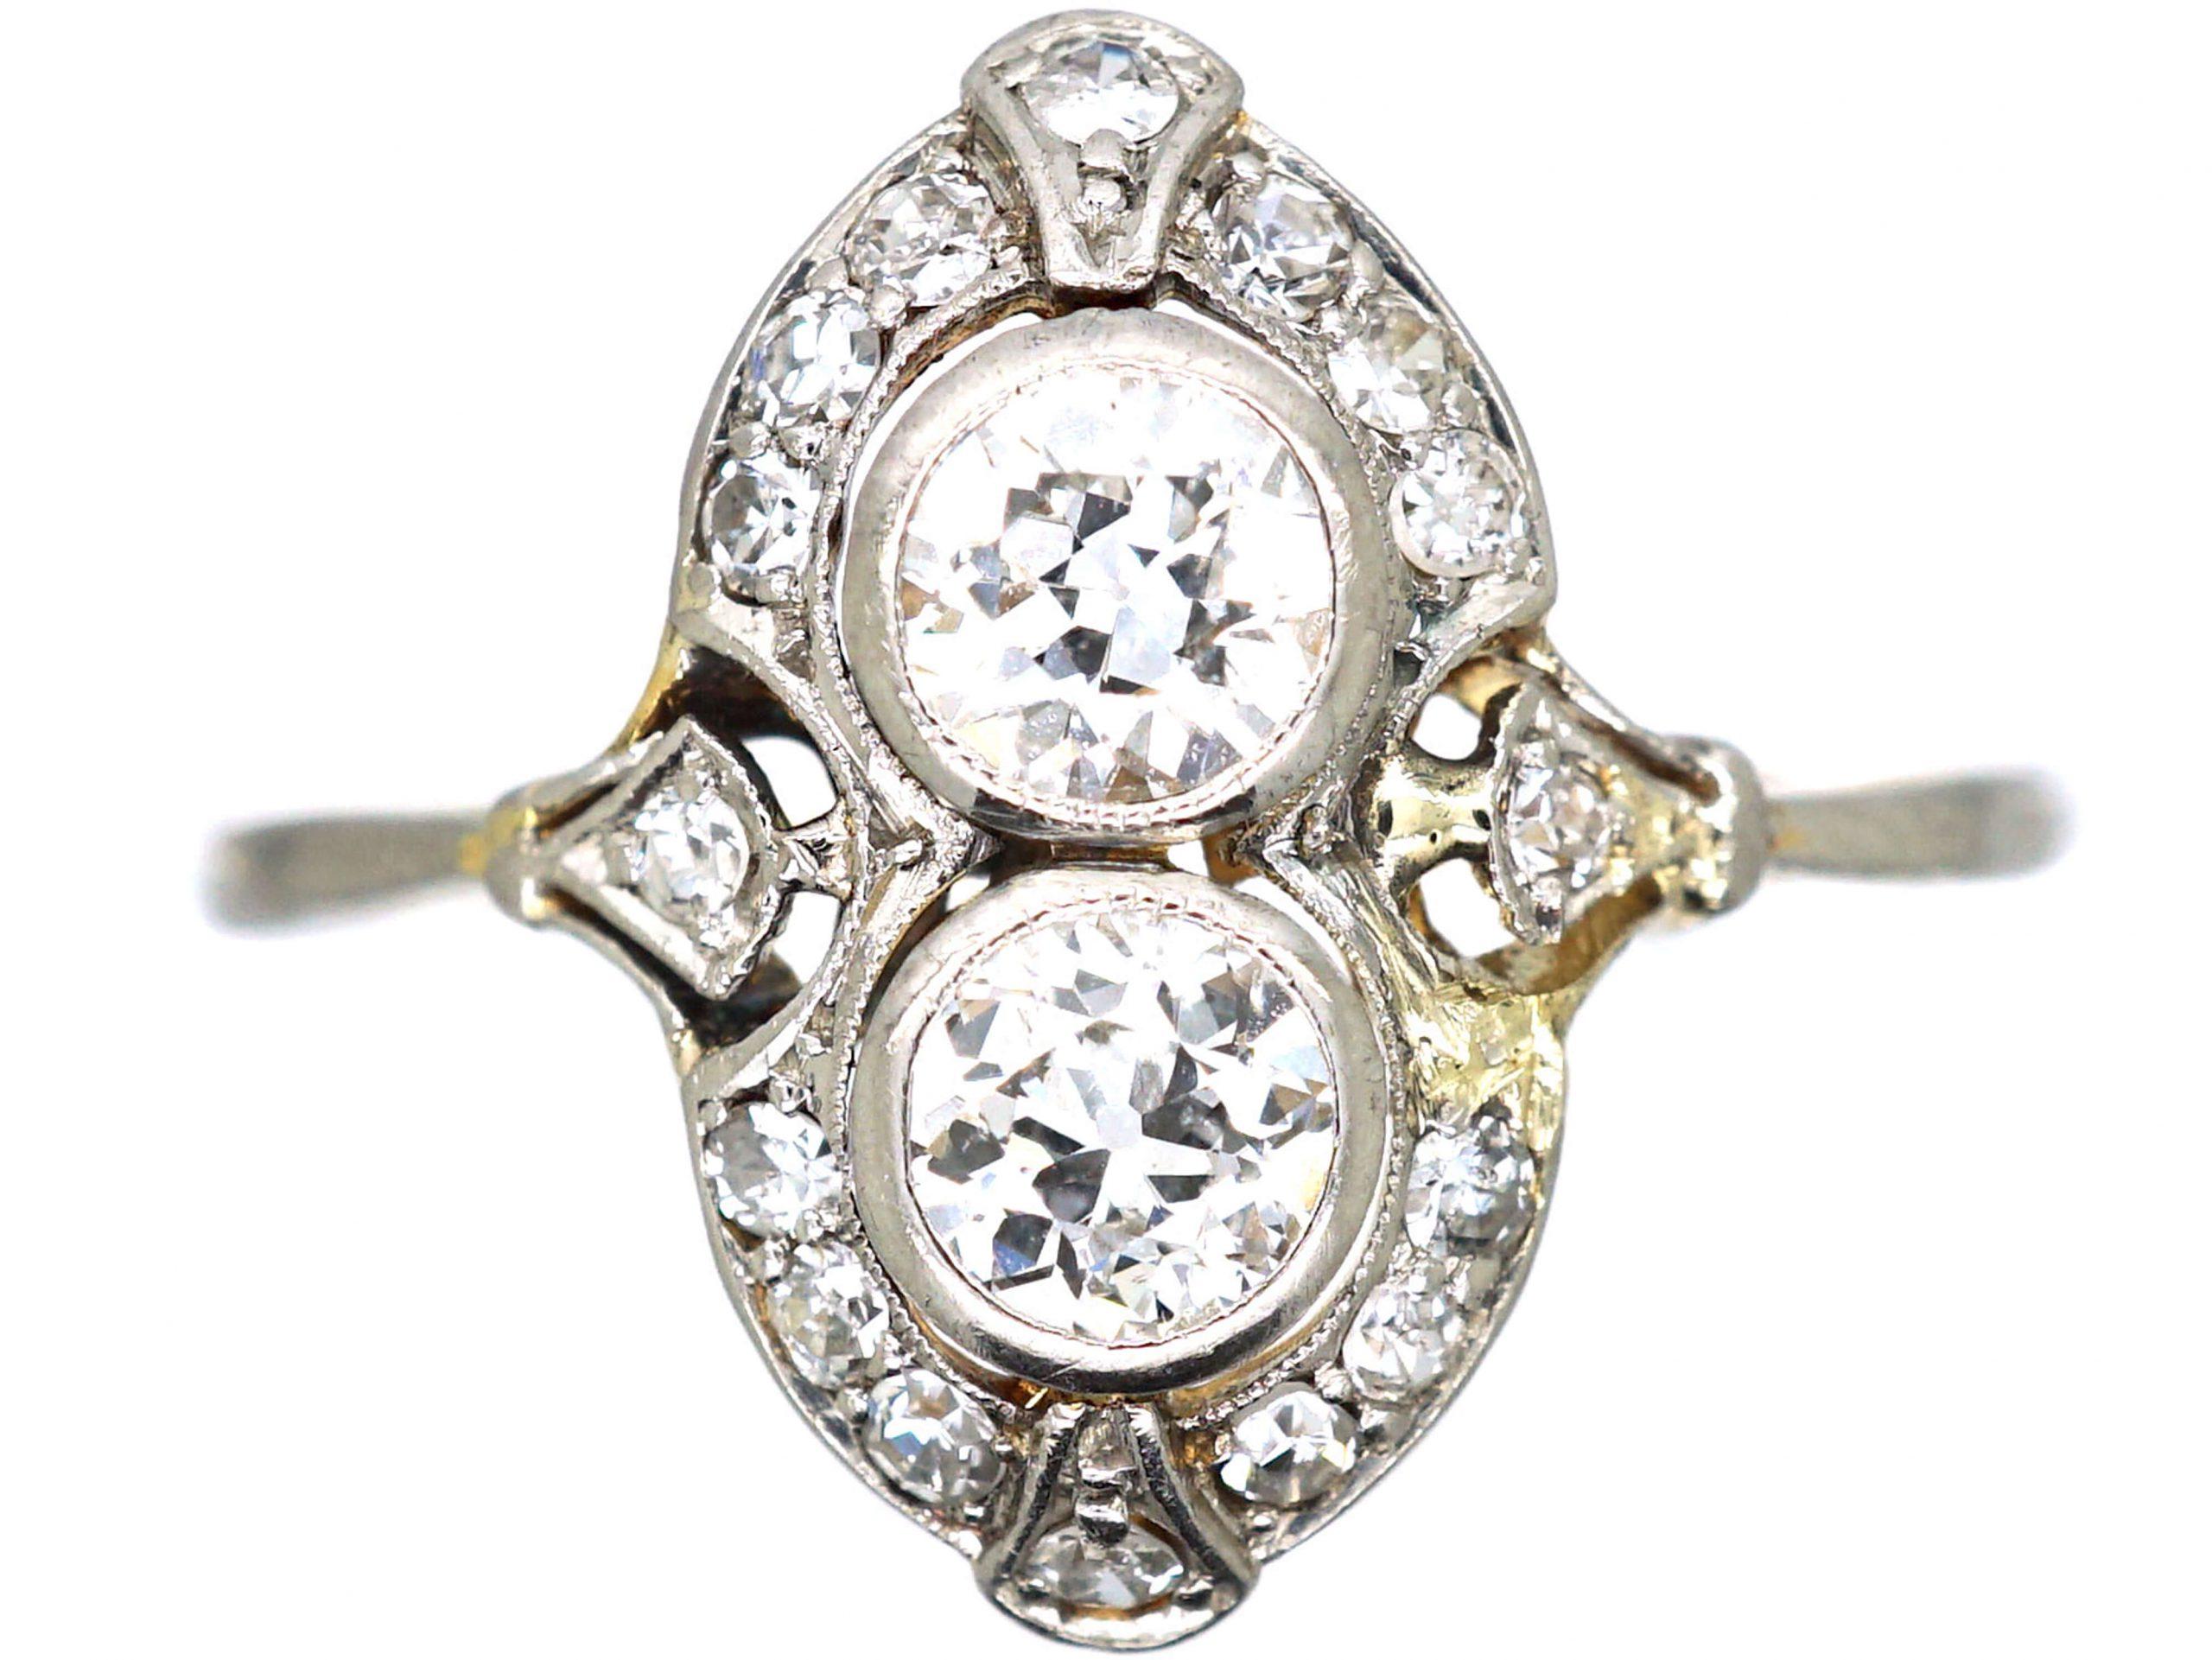 Art Deco 18ct Gold & Platinum, Two Stone Diamond Ornate Ring